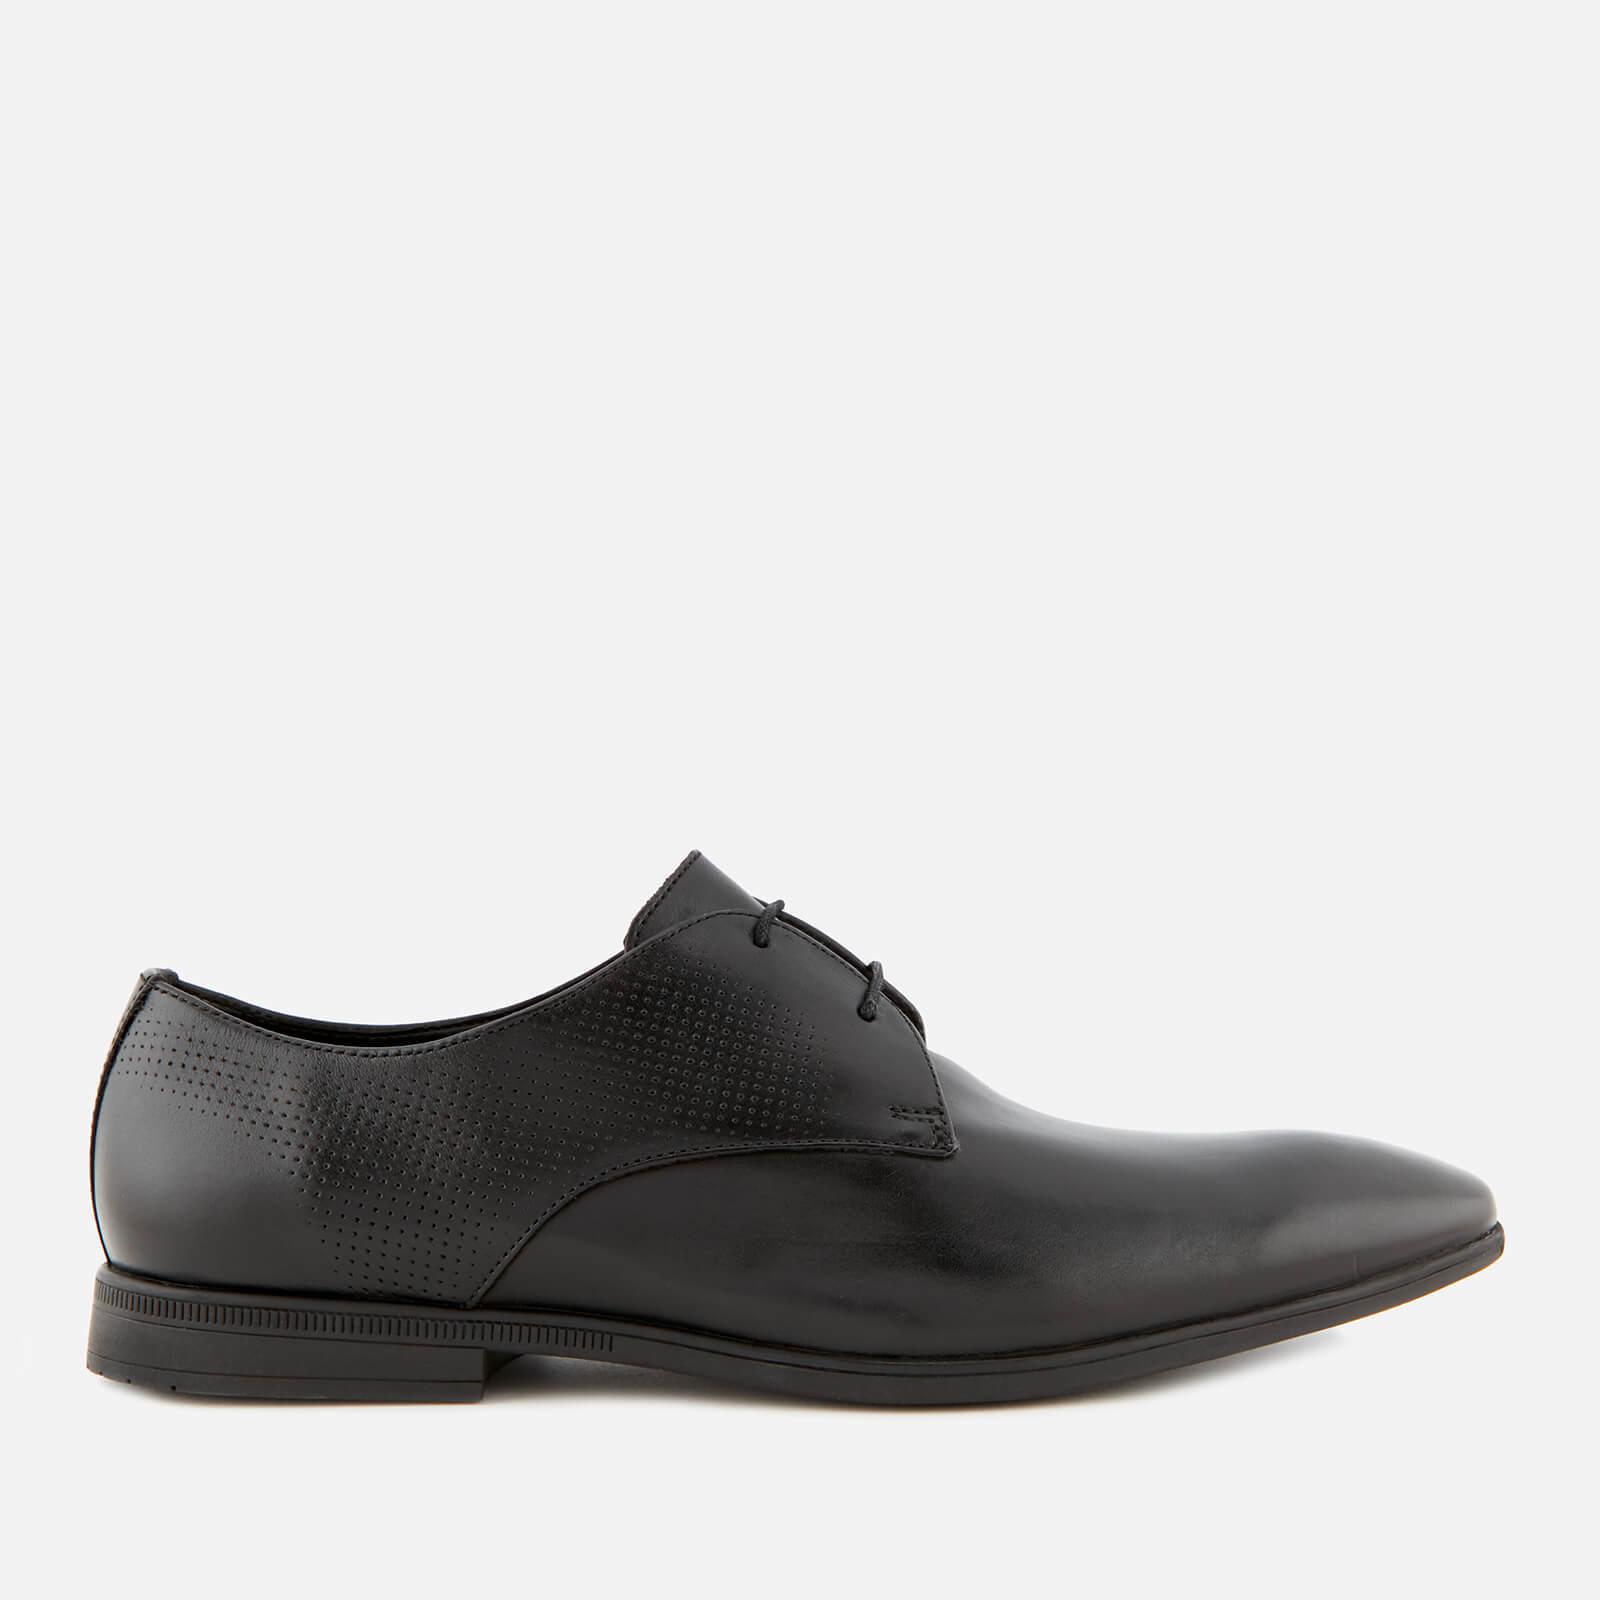 Clarks Men's Bampton Walk Leather Derby Shoes - Black - UK 9 - Black